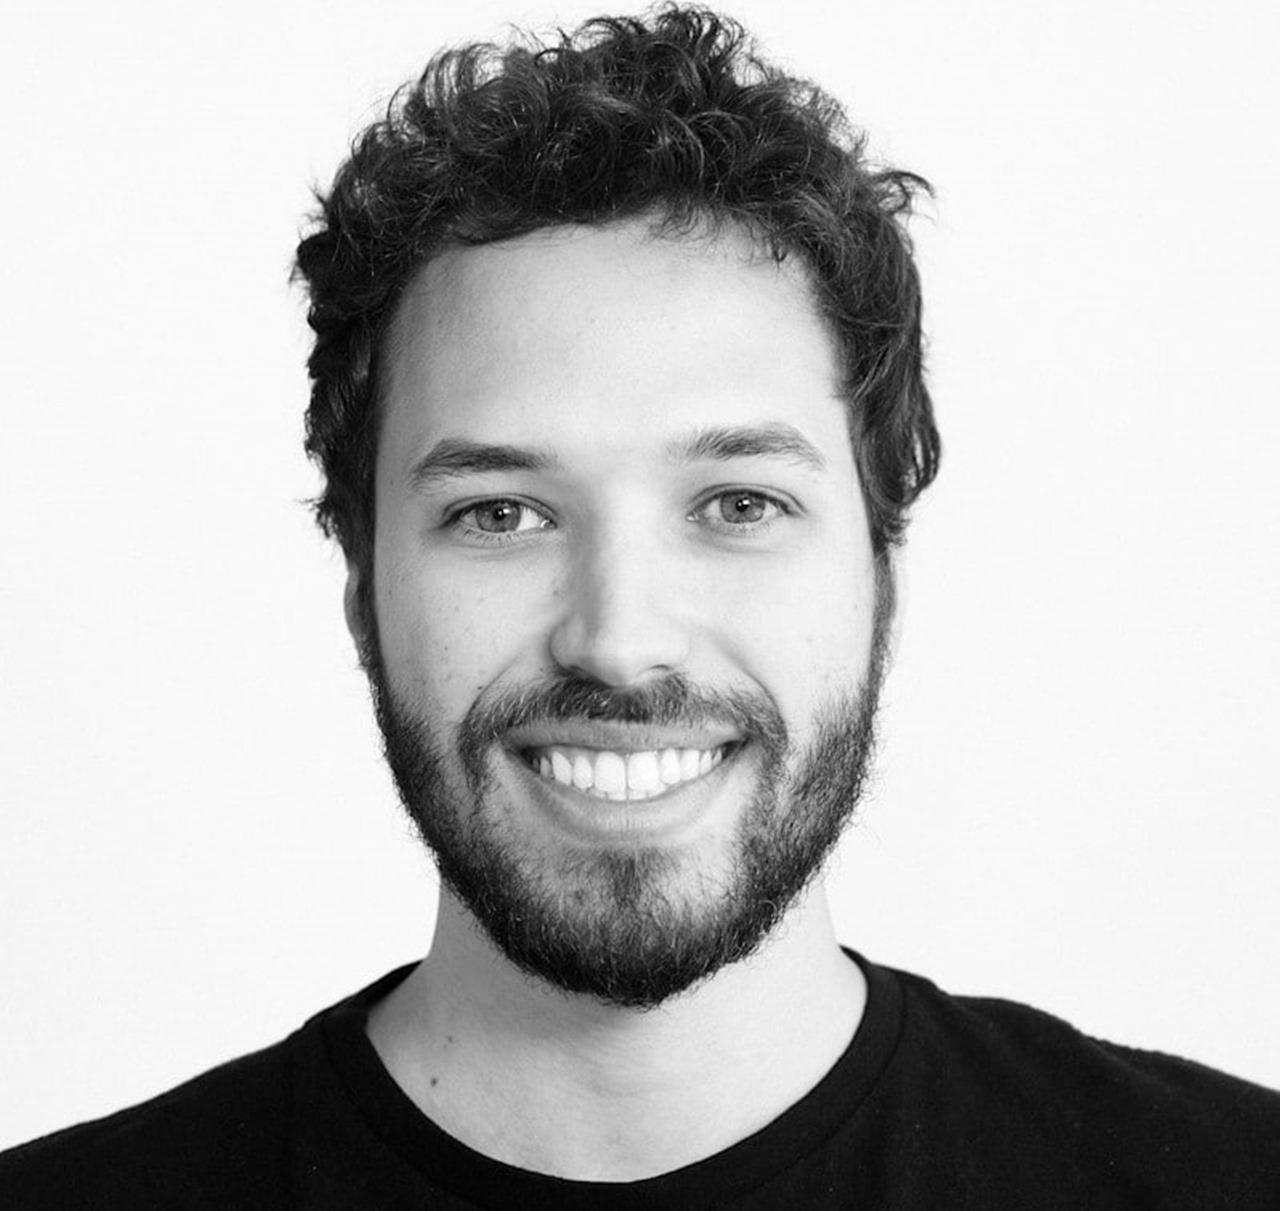 Pedro, fã de The Last of Us 2